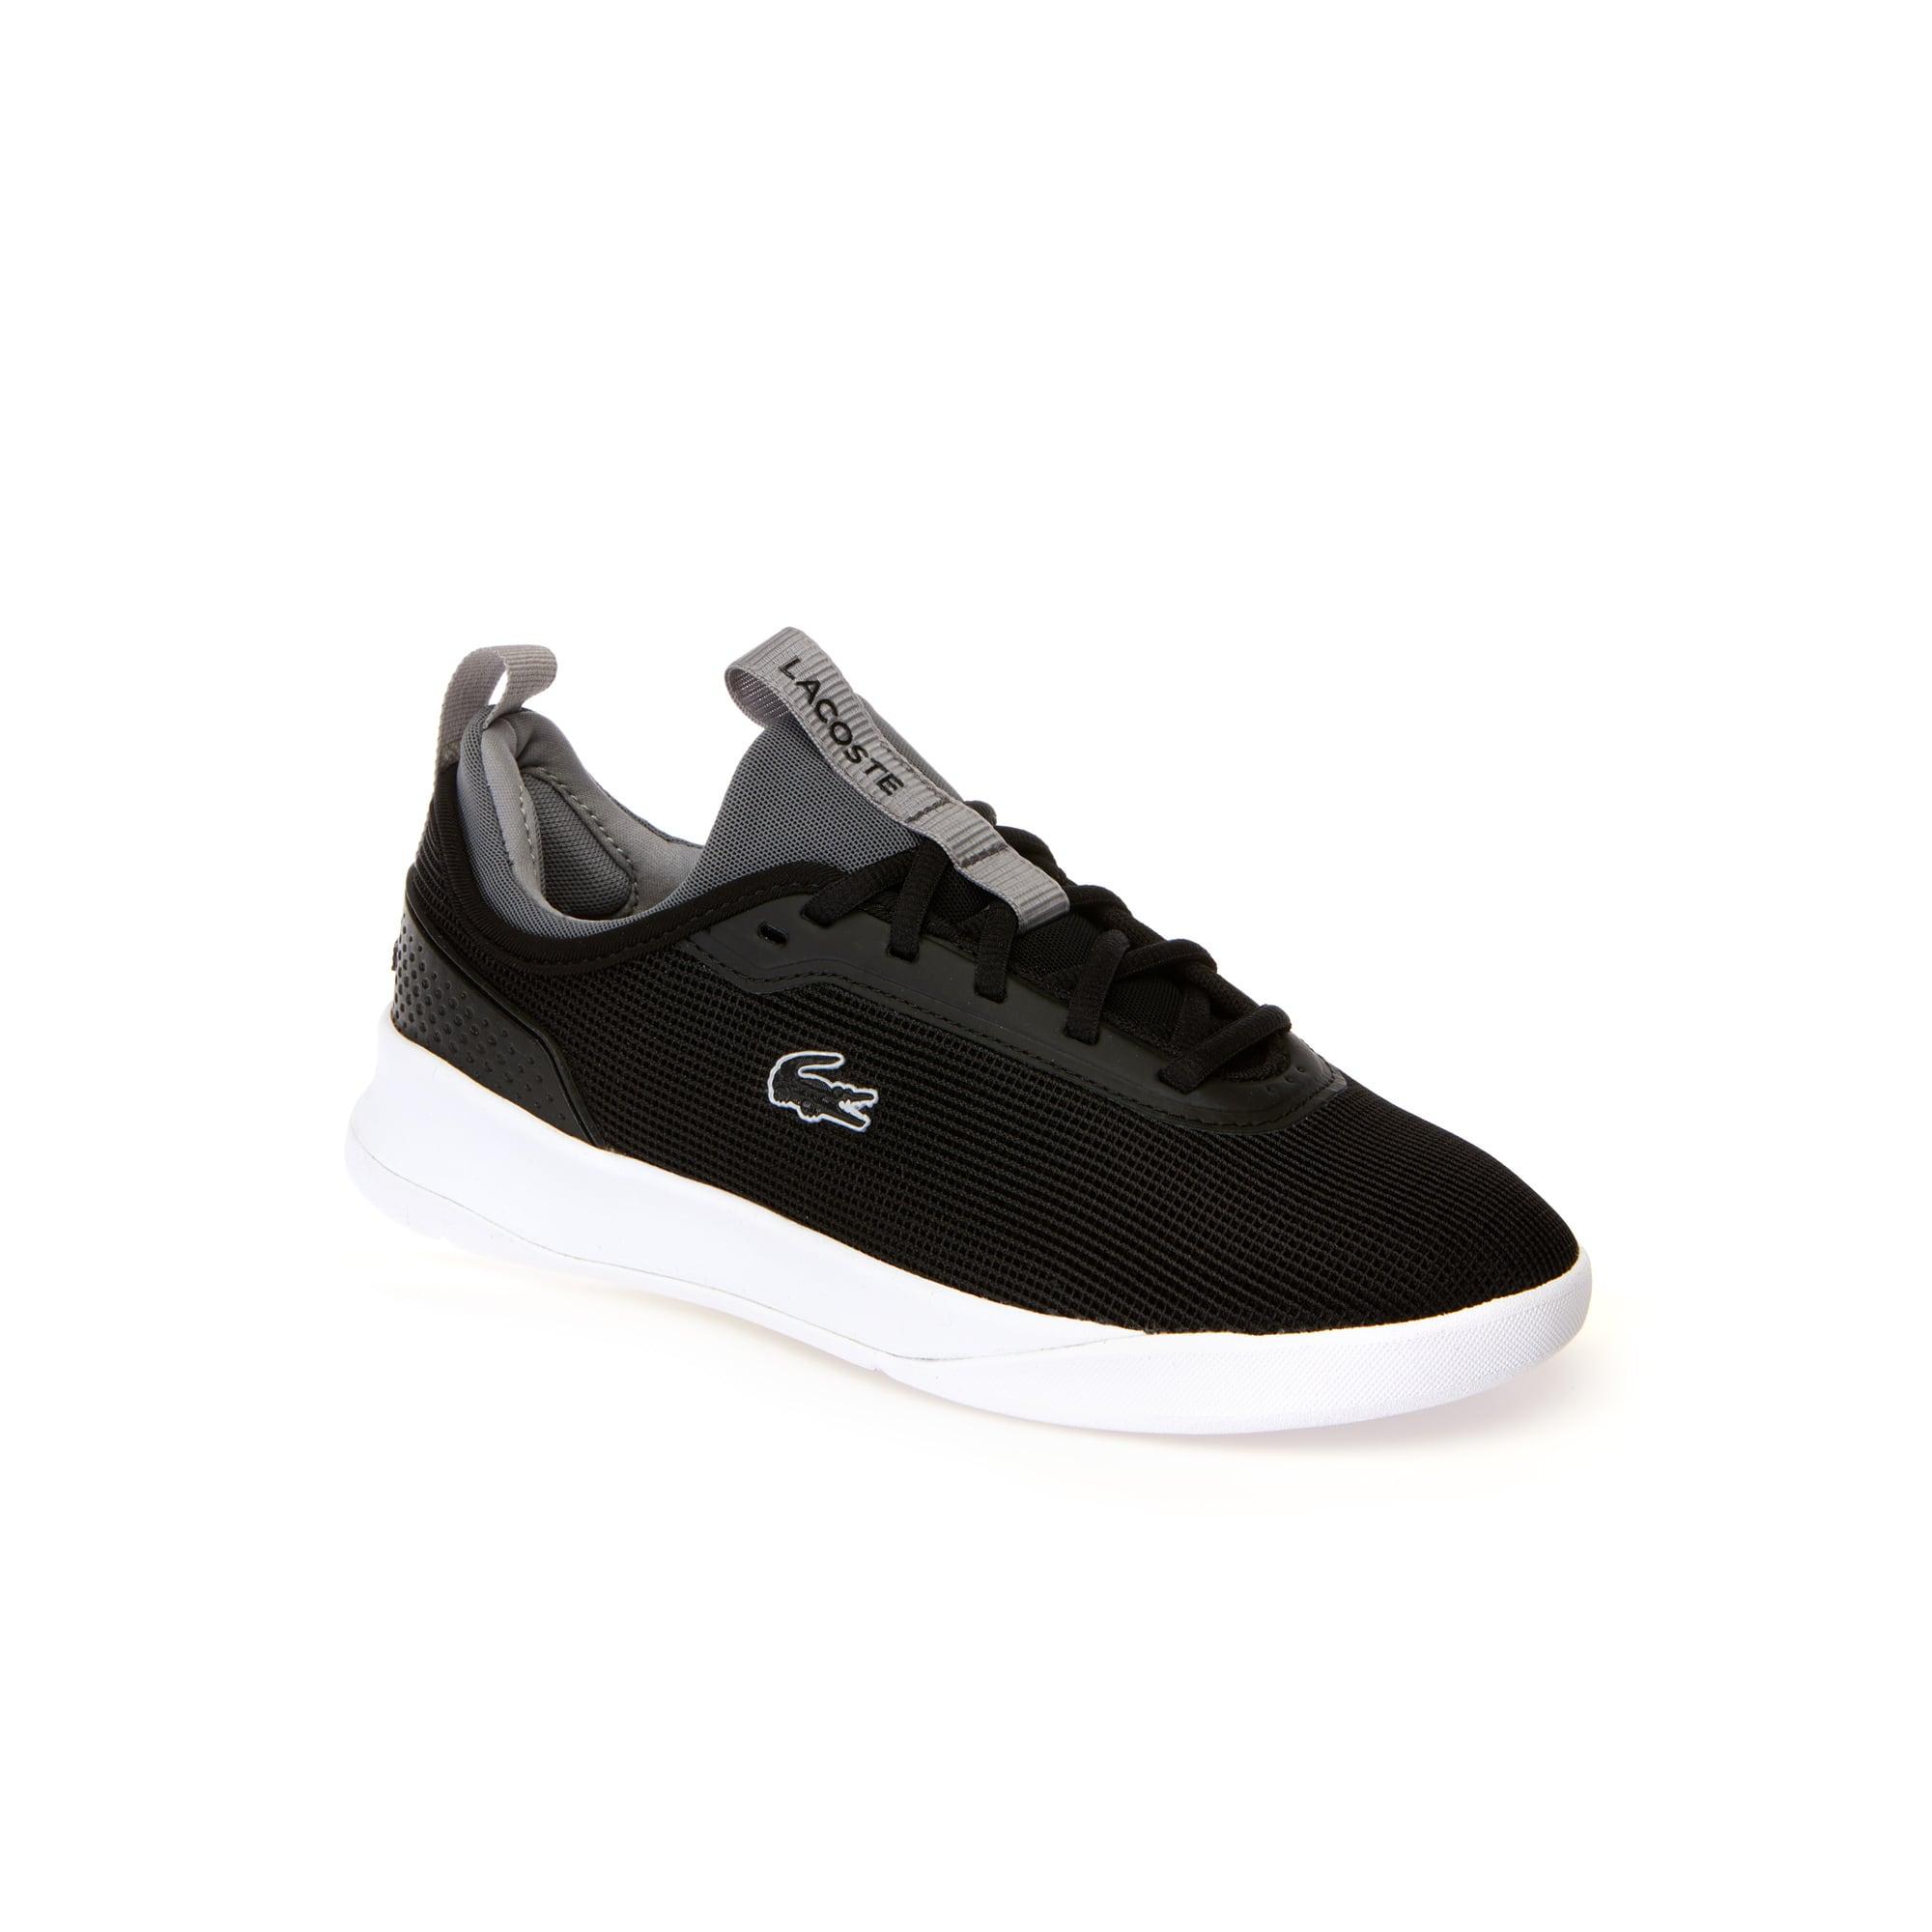 Damen-Sneaker LT SPIRIT aus Textil LACOSTE SPORT